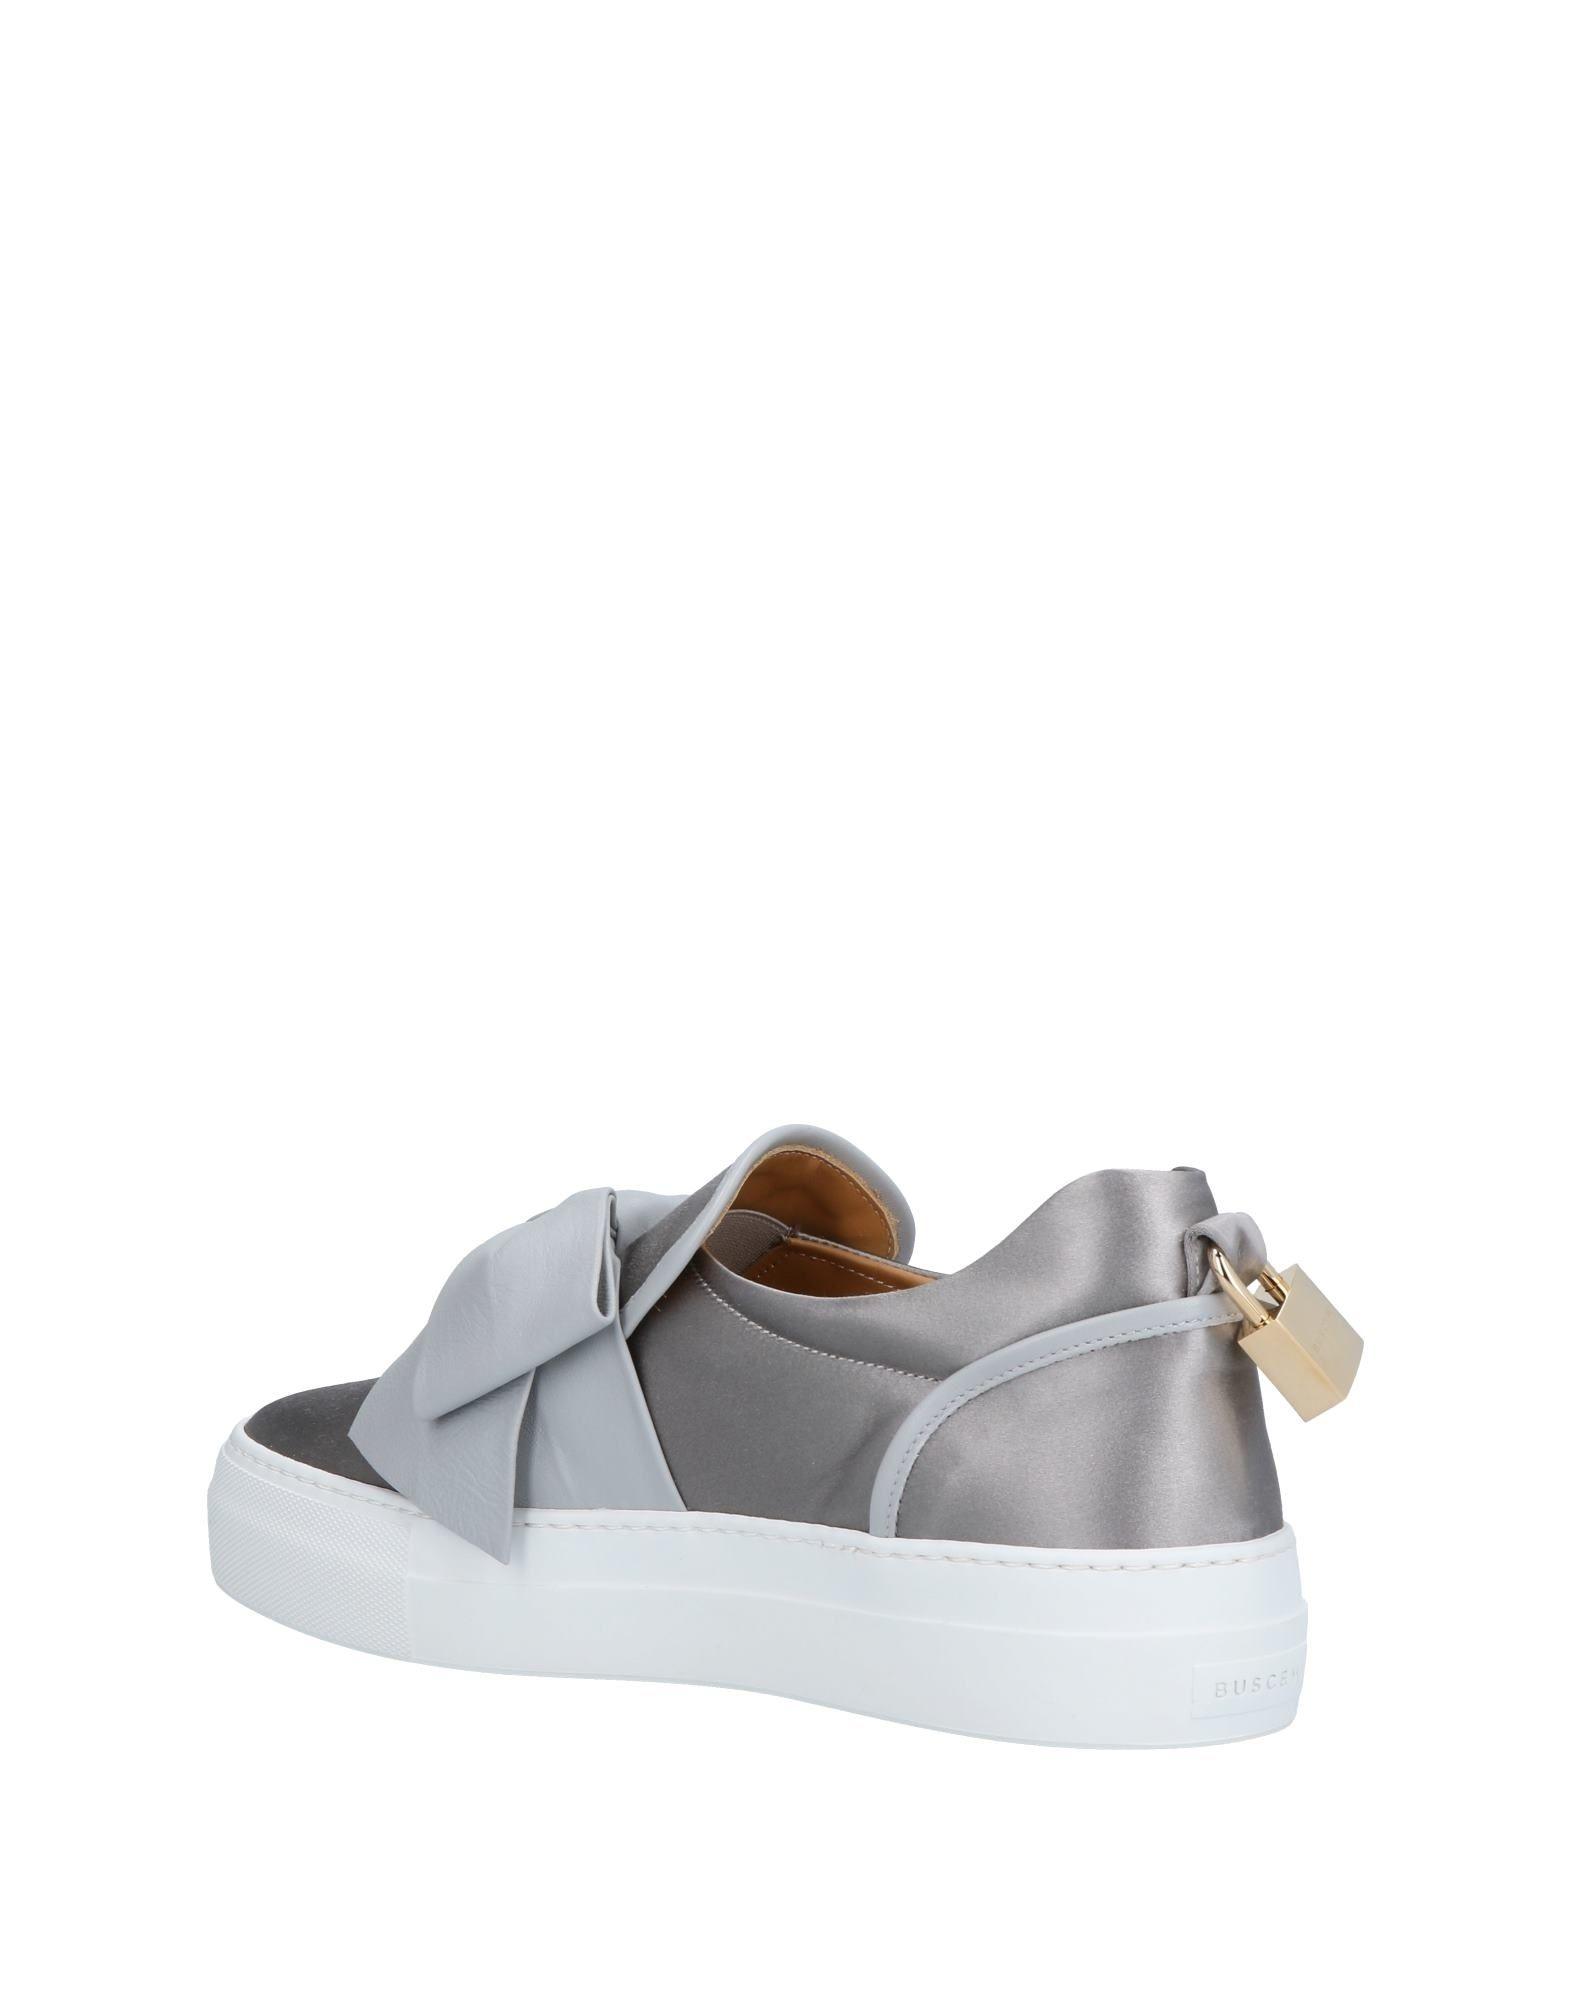 Buscemi Sneakers Damen Schuhe  11473066CAGünstige gut aussehende Schuhe Damen f60805